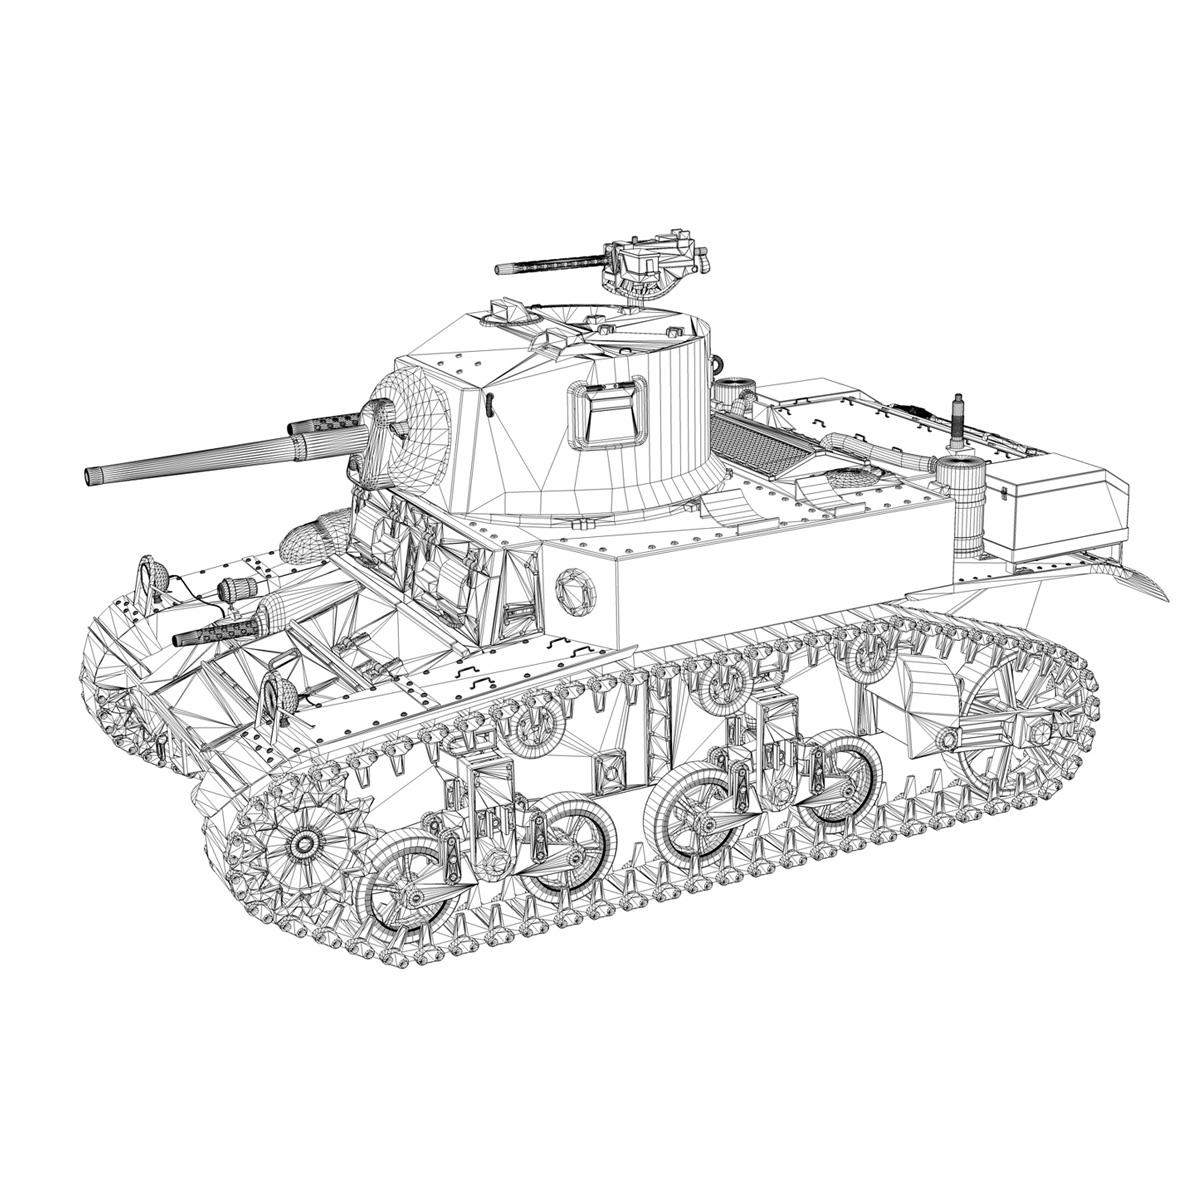 m3a1 light tank stuart – 156700 3d model c4d fbx lwo lw lws obj 3ds 265345